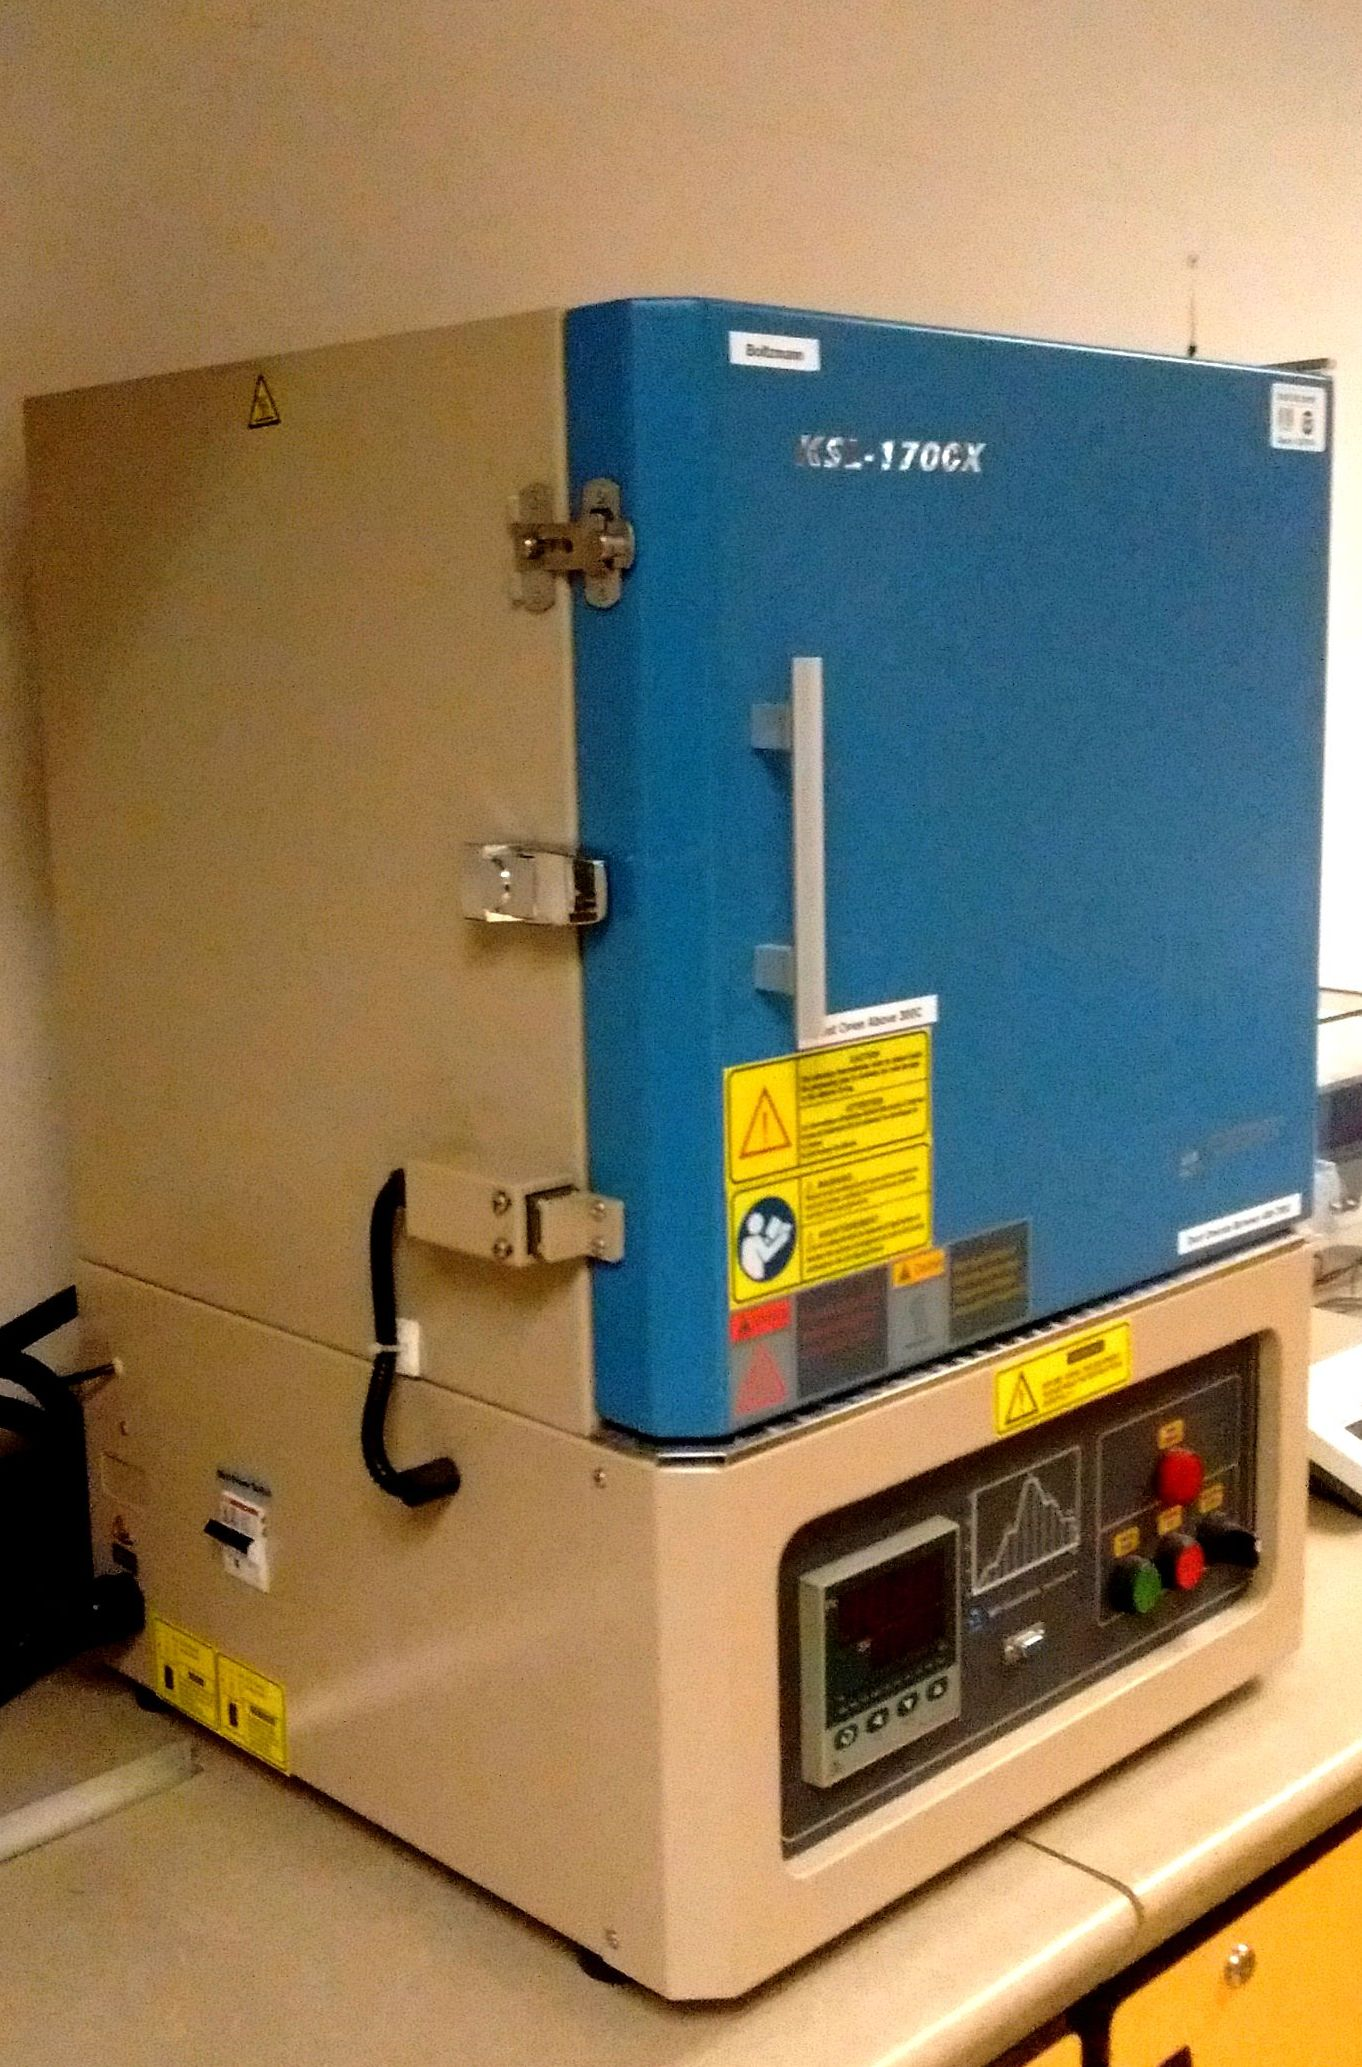 Muffle furnace: max T = 1700 C